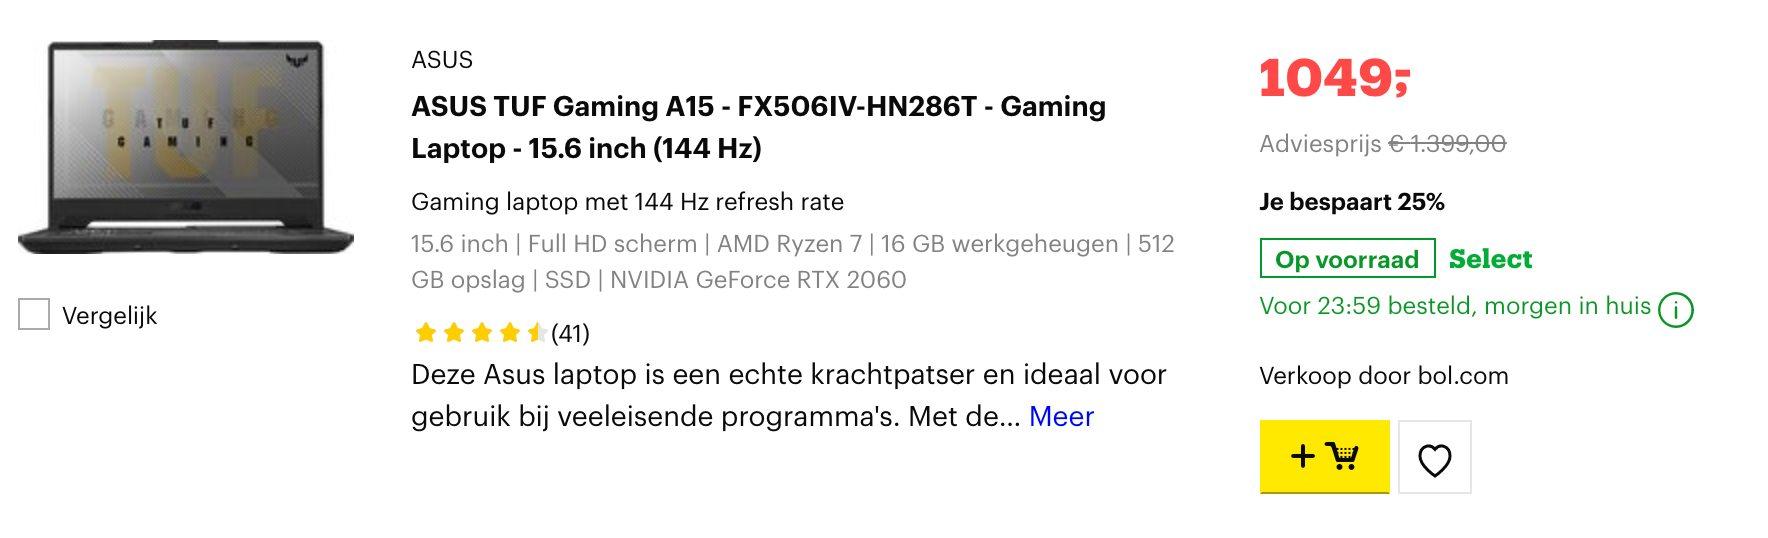 ASUS TUF Gaming A15 - FX506IV-HN286T